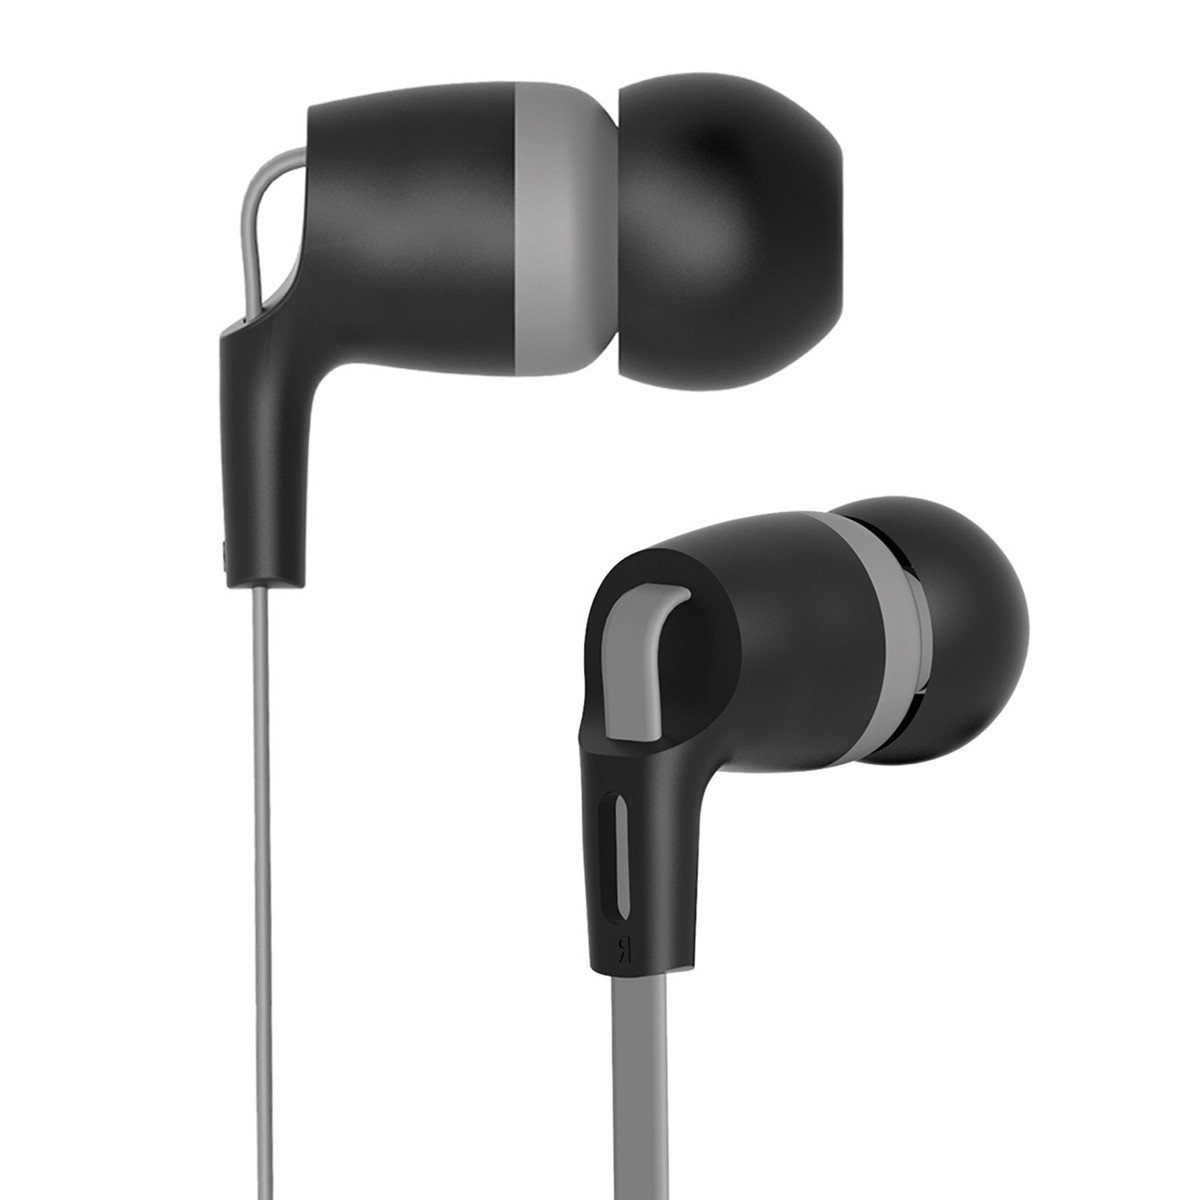 Sanfire Ear Headphones